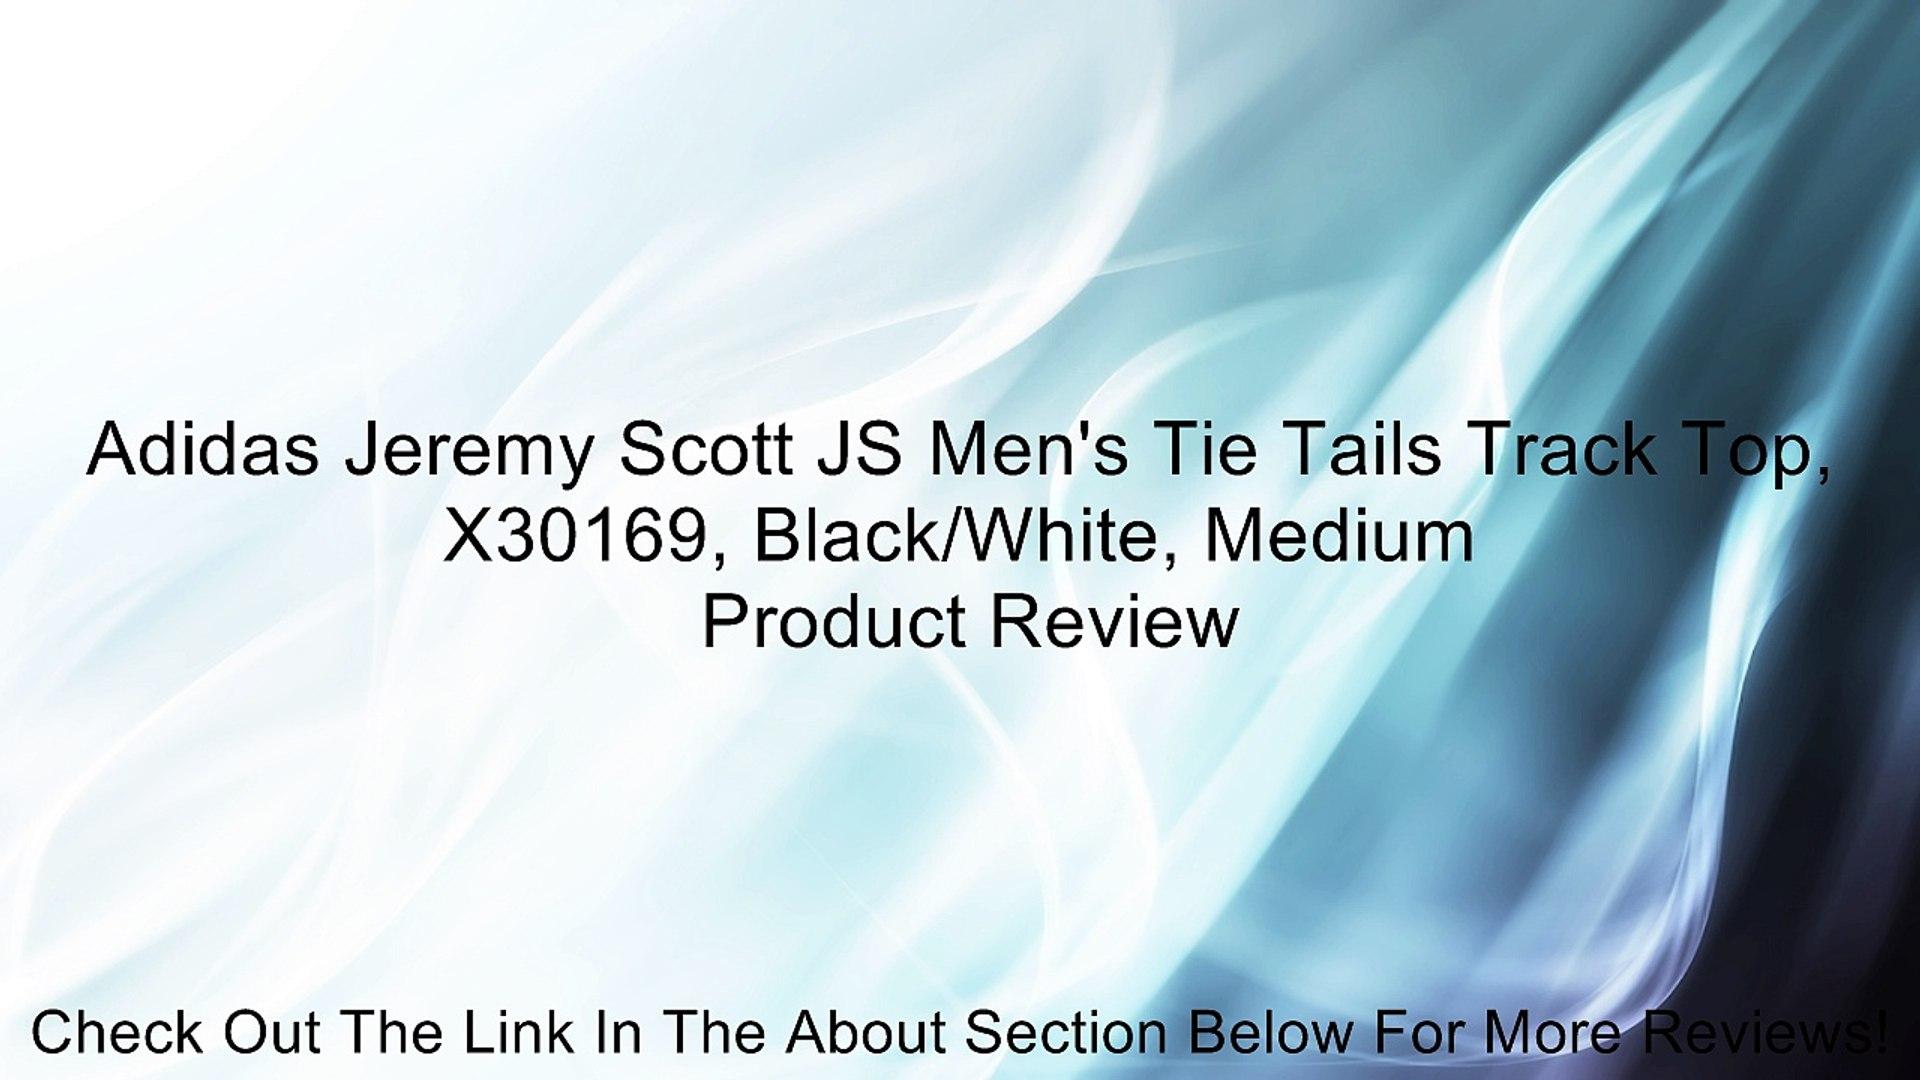 Adidas Jeremy Scott JS Men's Tie Tails Track Top, X30169, Black/White, Medium Review